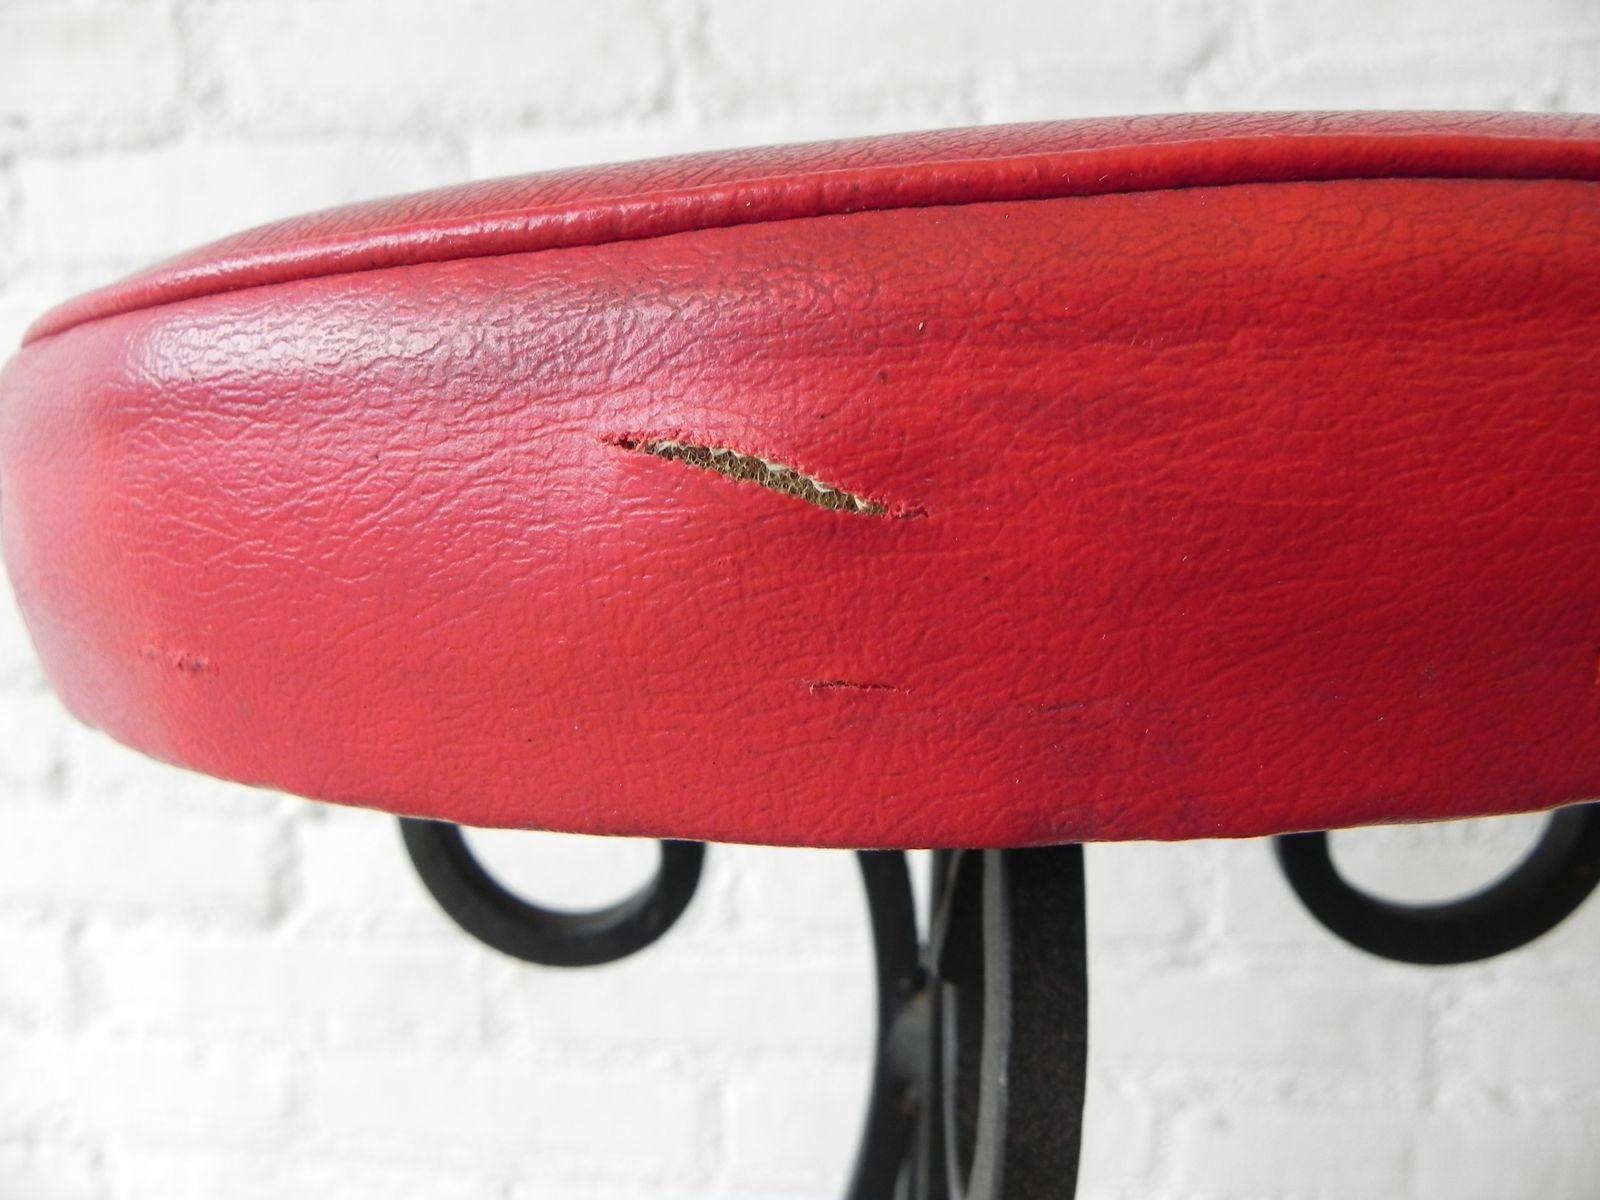 Belgischer barhocker in schwarz rot bei pamono kaufen for Barhocker in rot